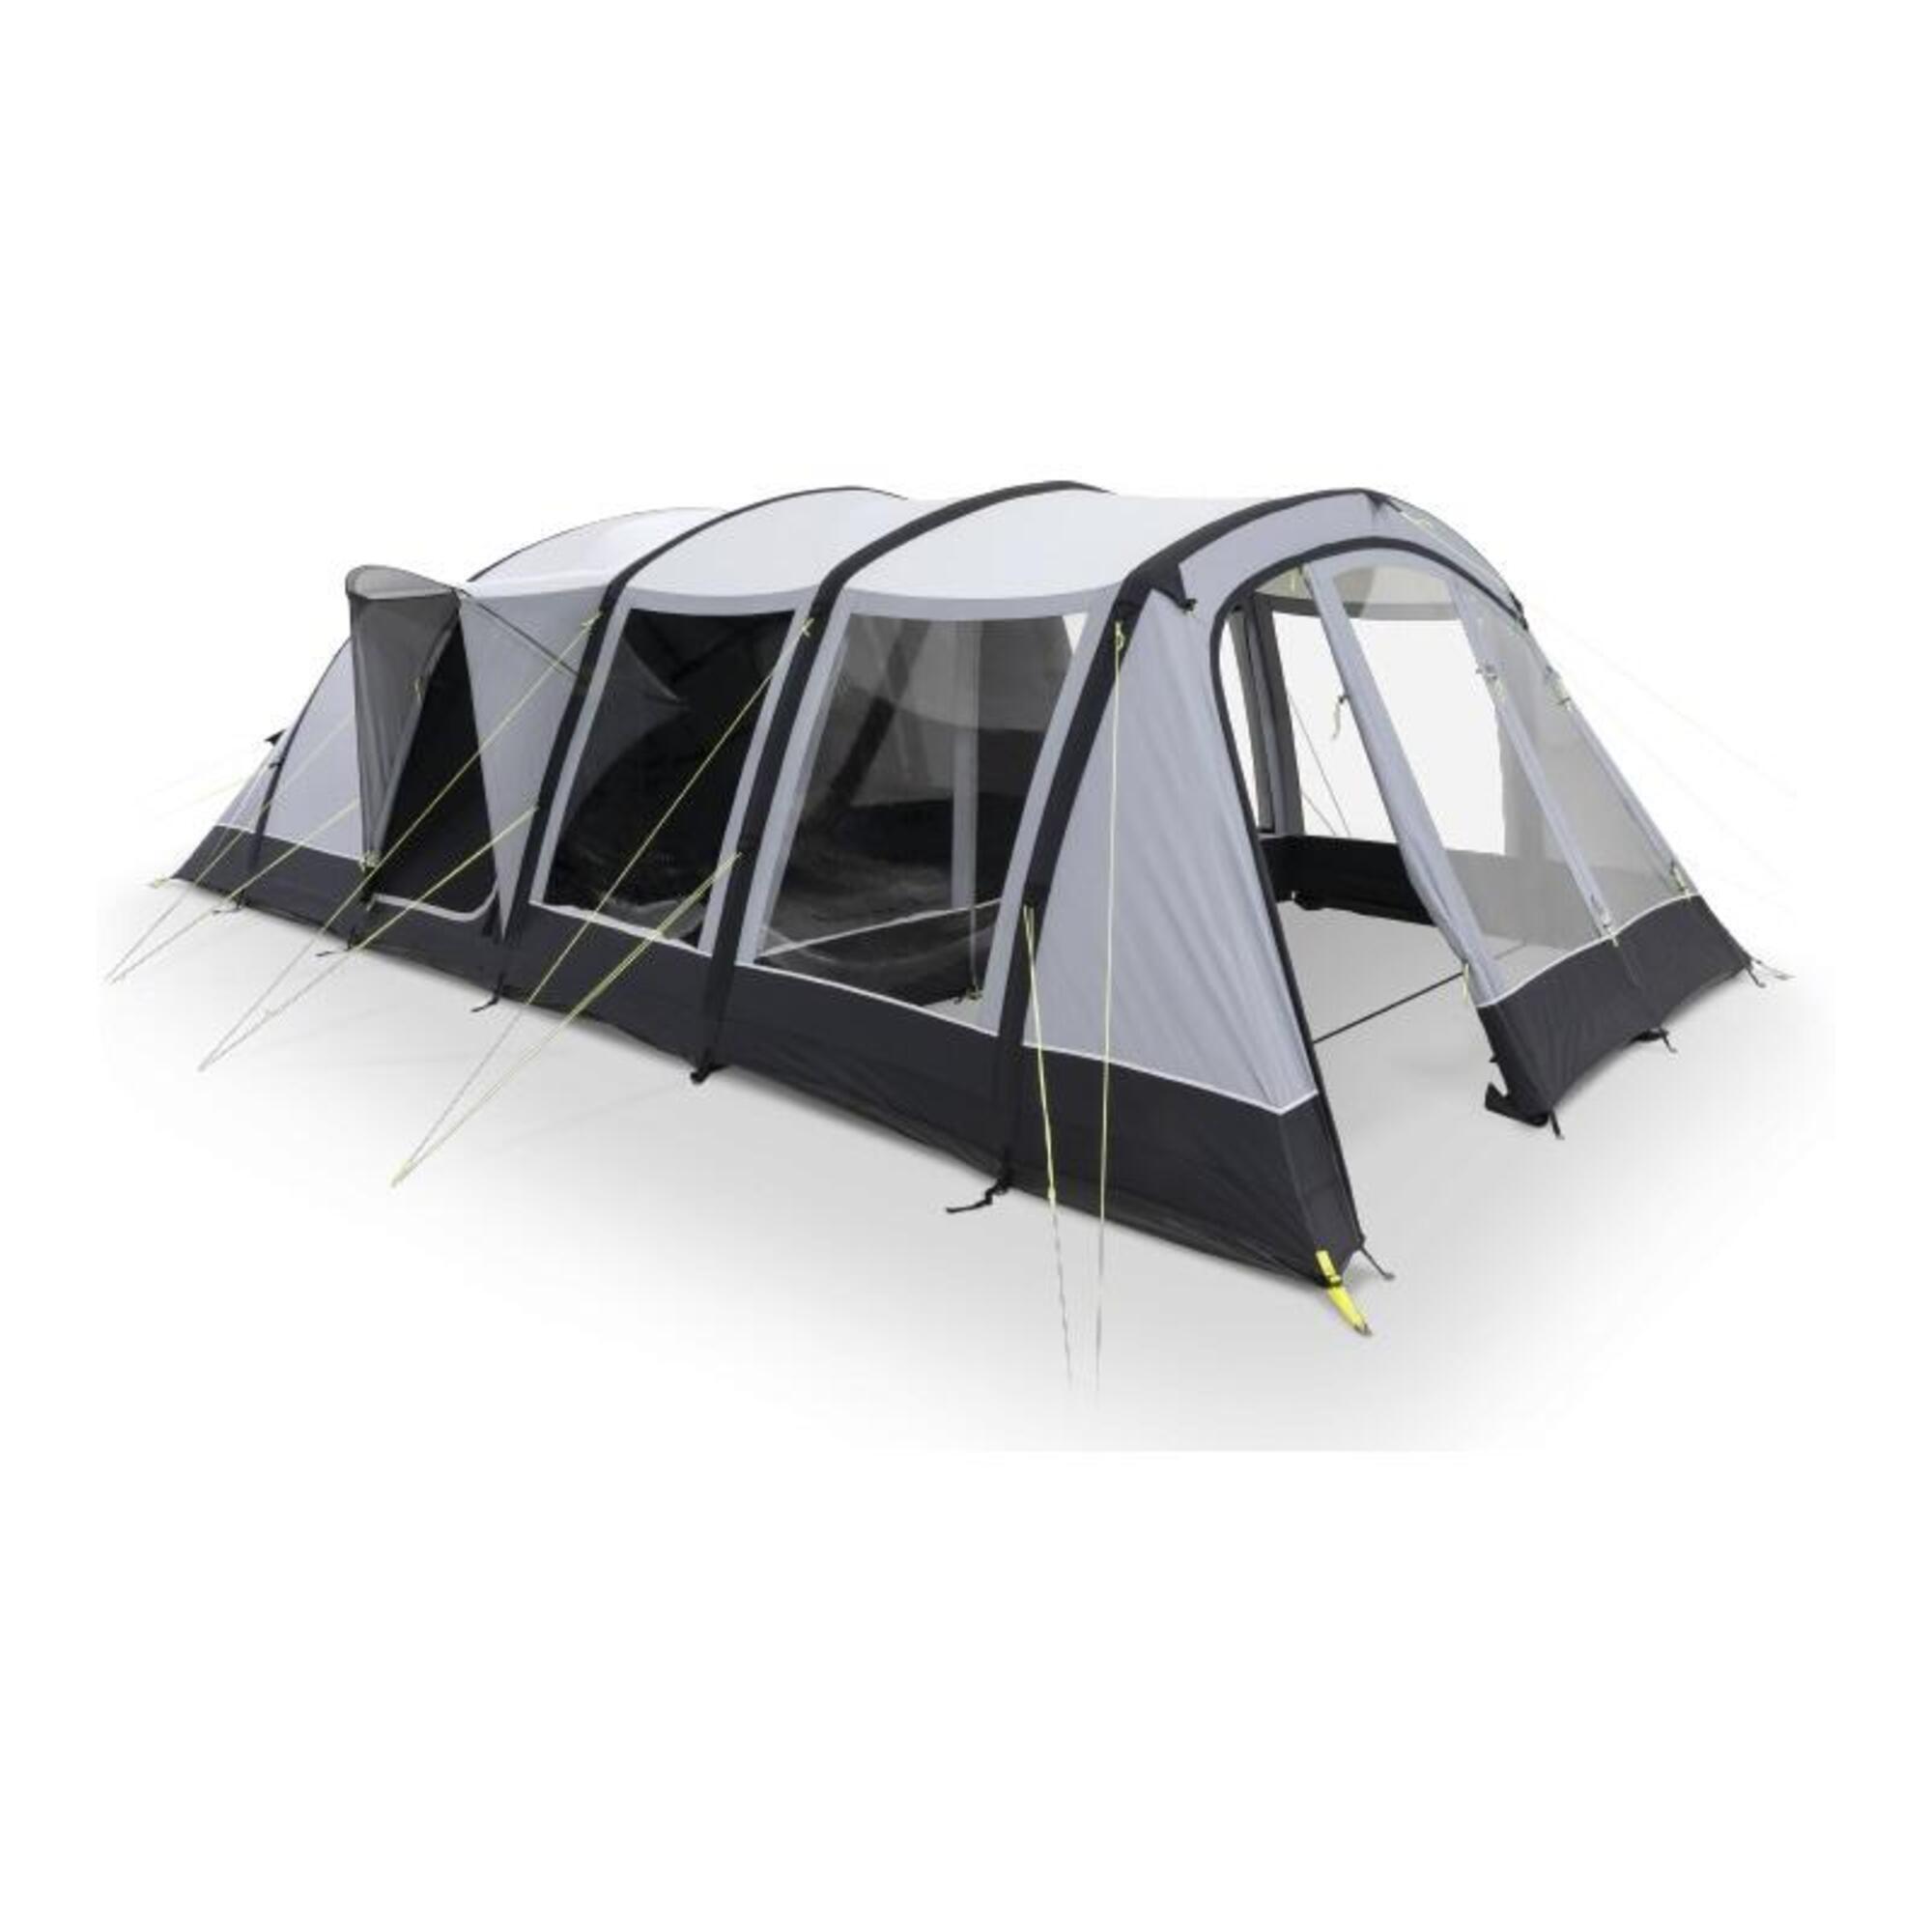 Kampa Dometic Croyde 6 AIR TC Inflatable Tent